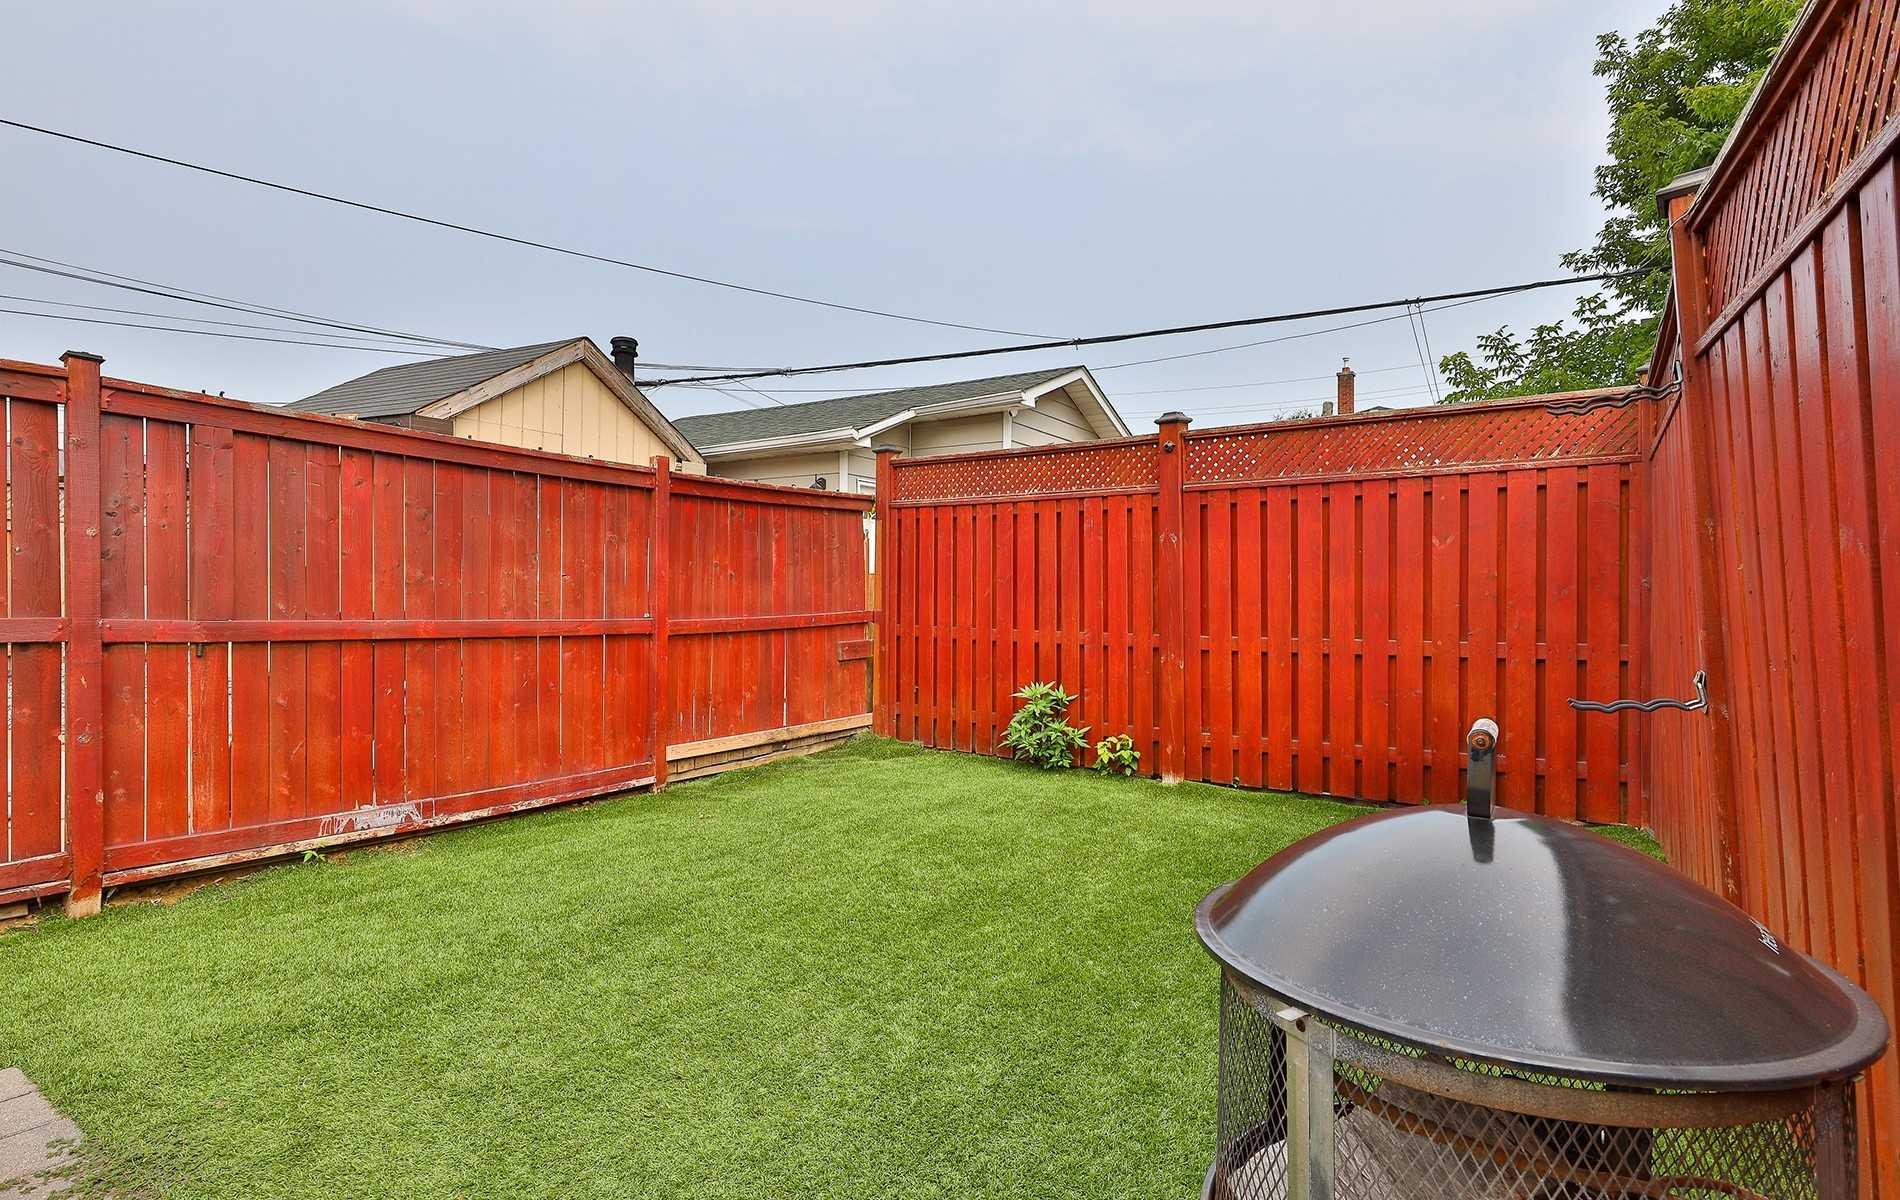 118 Northland Ave, Toronto, Ontario M6N2E2, 3 Bedrooms Bedrooms, 7 Rooms Rooms,3 BathroomsBathrooms,Detached,For Sale,Northland,W5326170